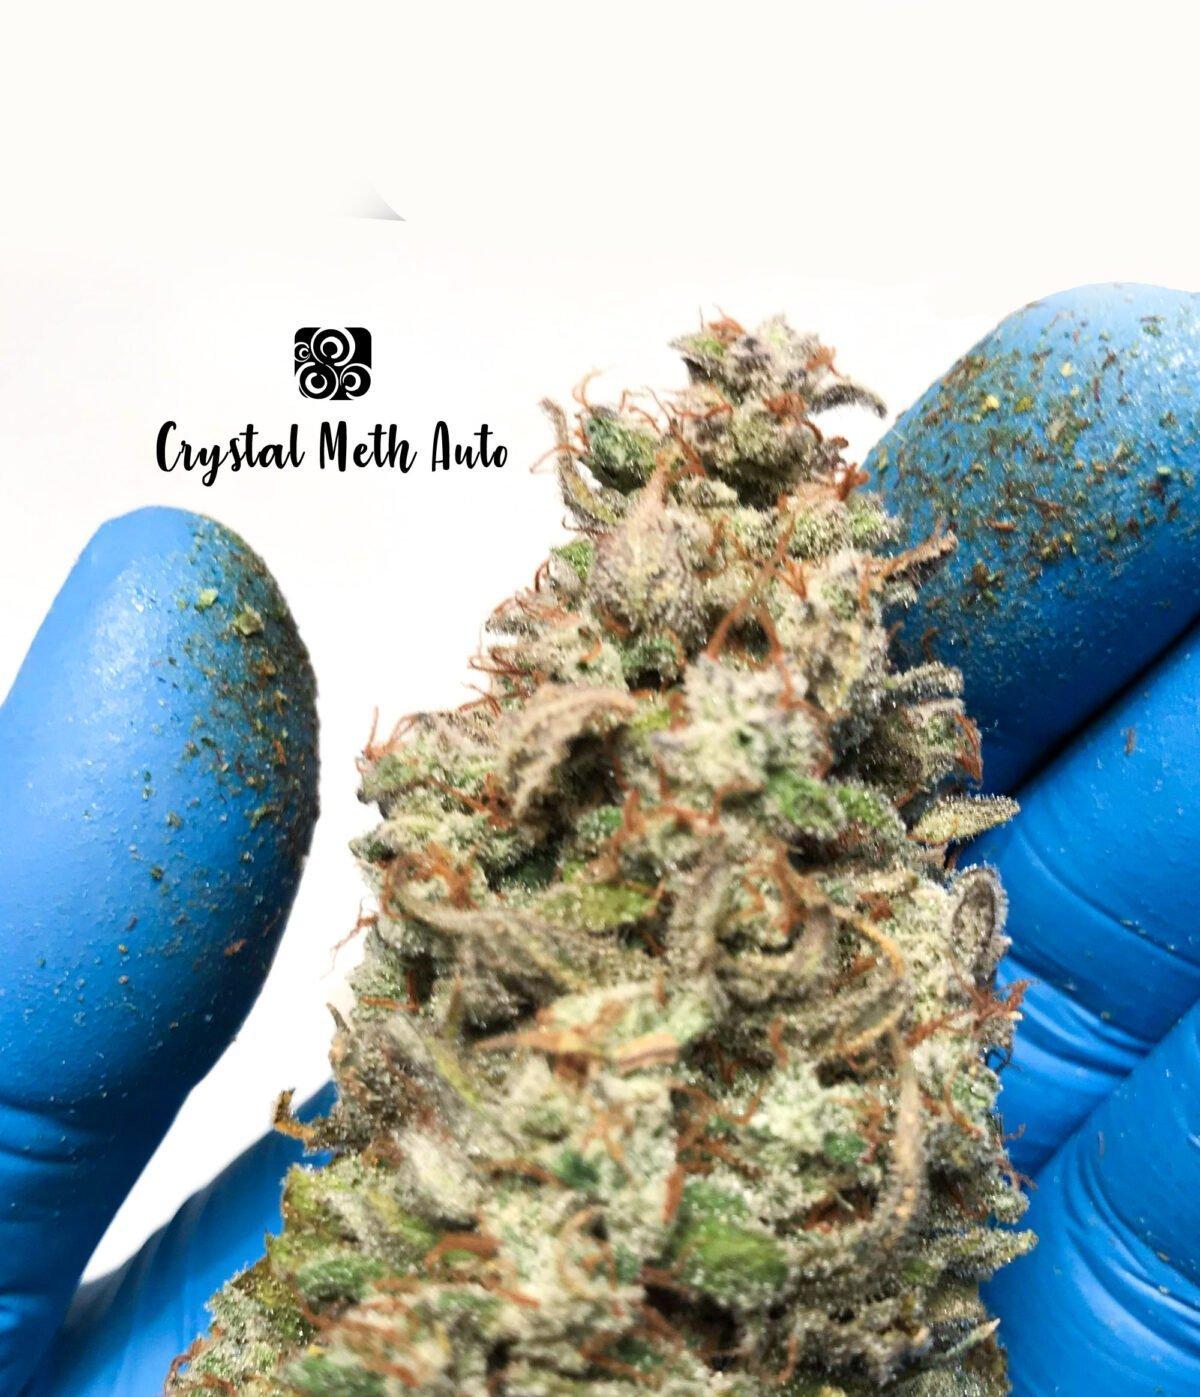 Crystal Meth Auto 5 1